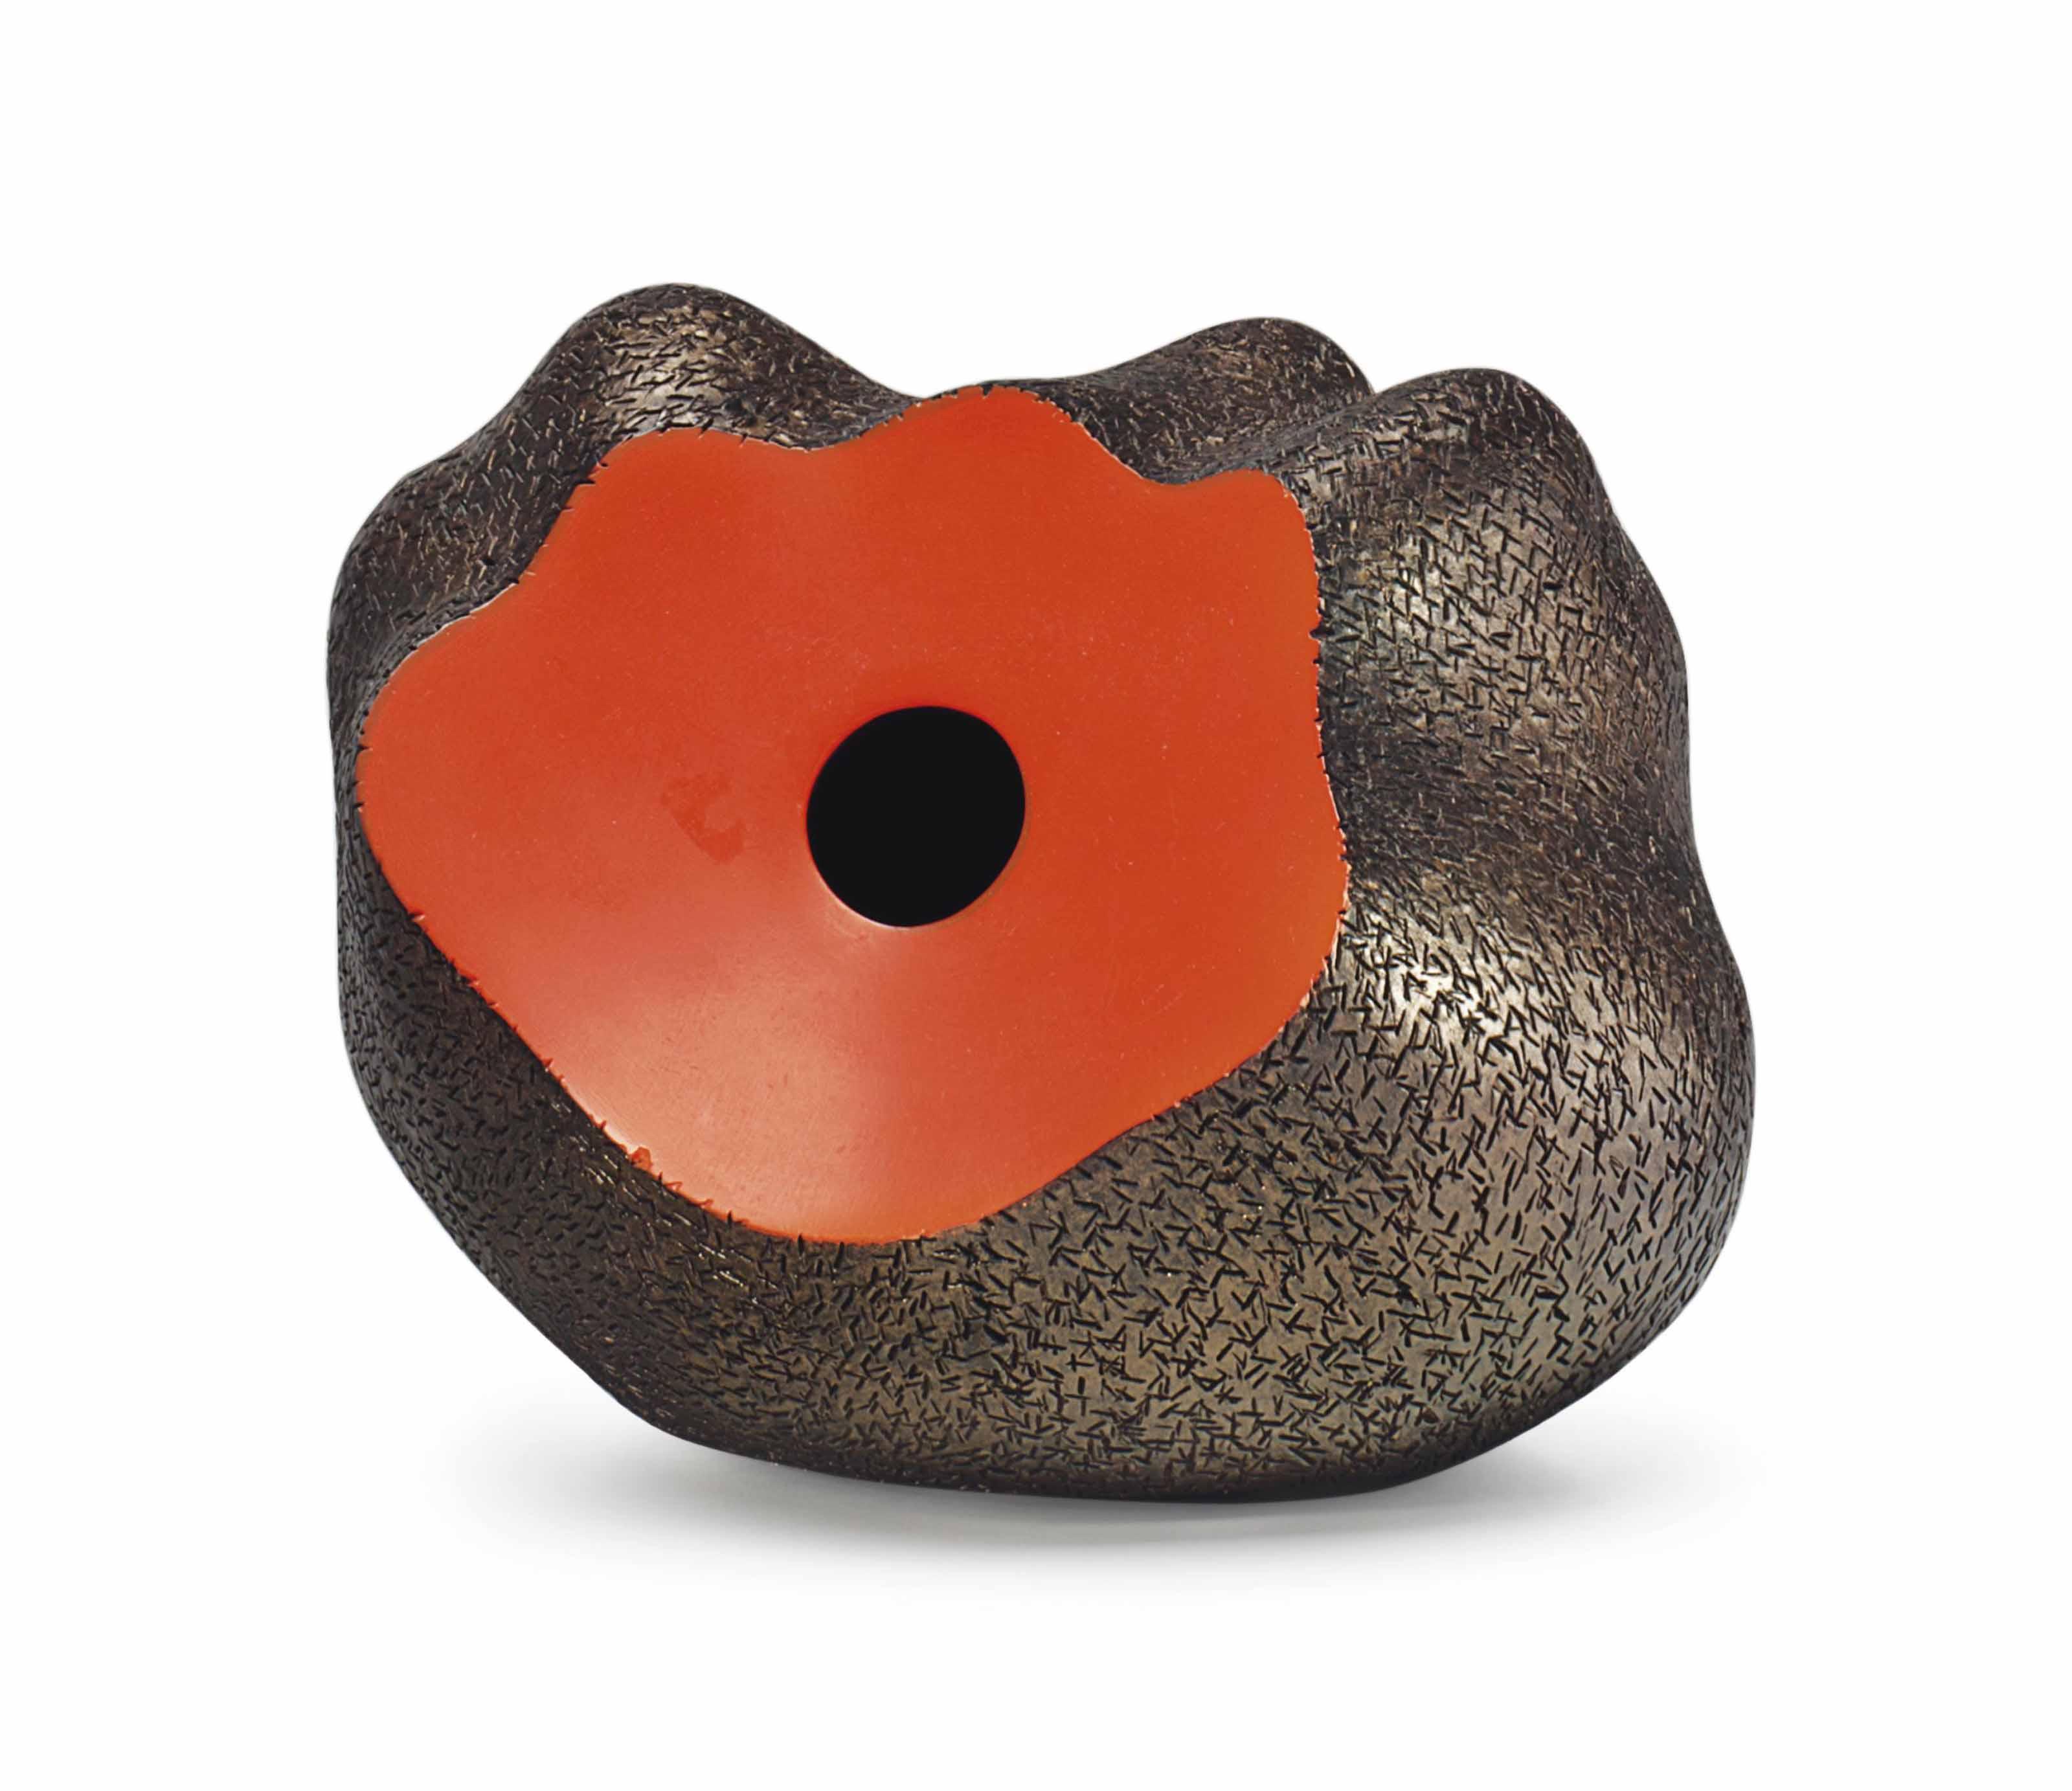 Untitled (Hybrid Ceramic Sculpture)